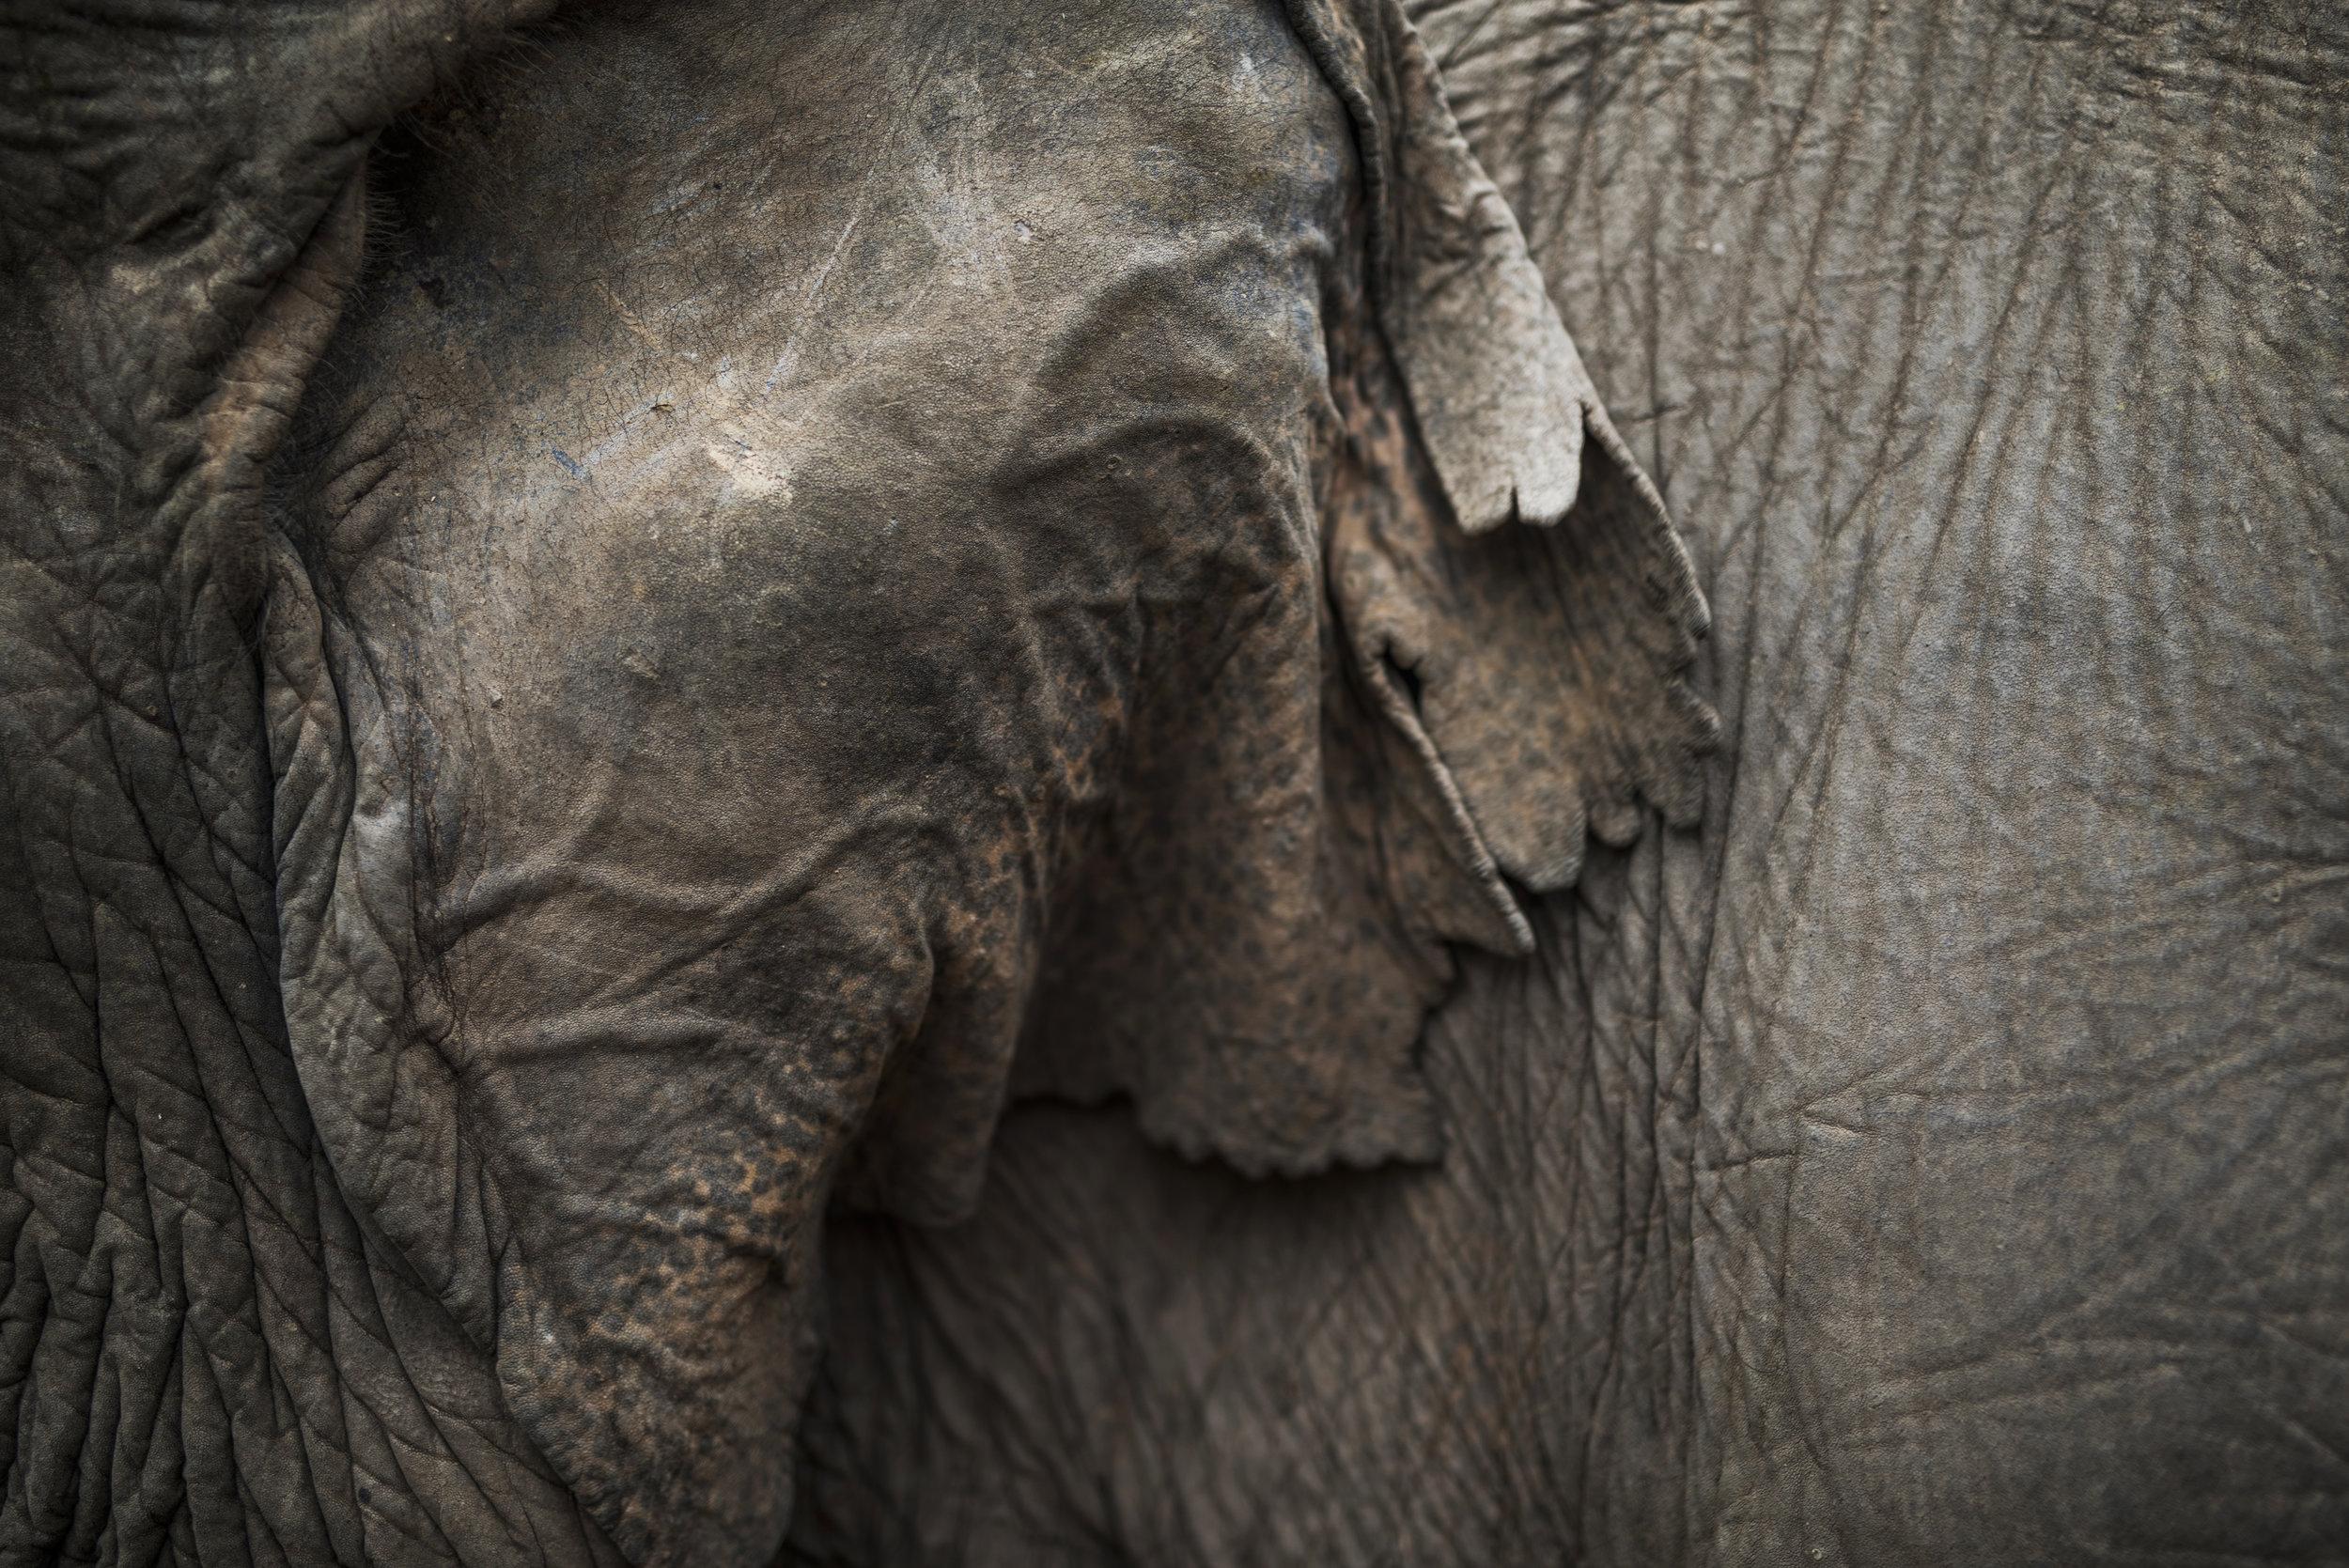 elephants (82).jpg